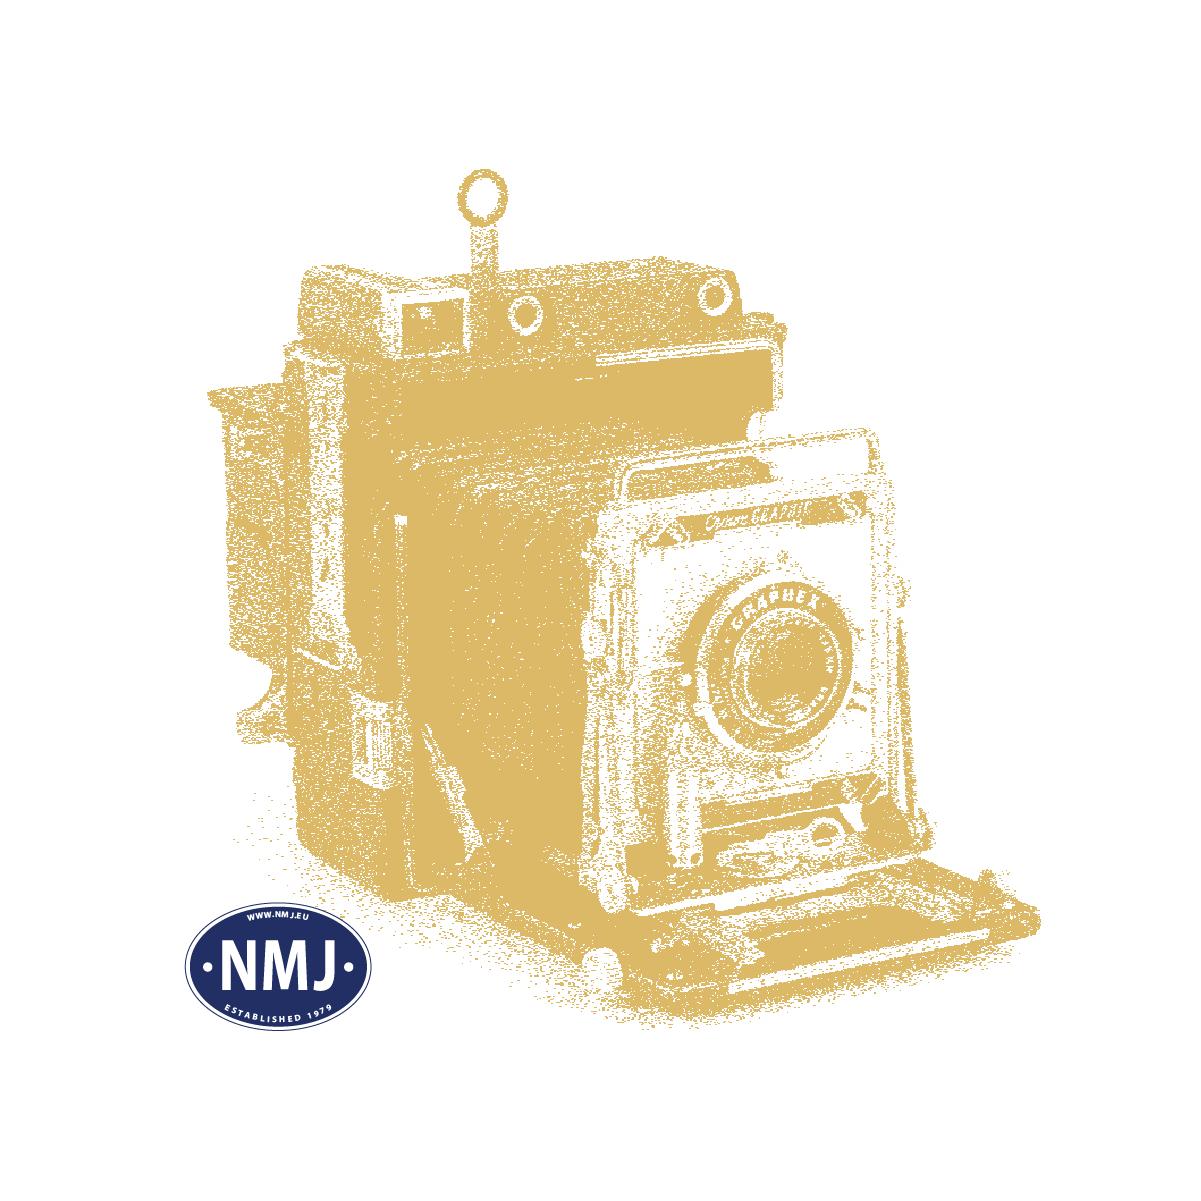 NMJSTl316570 - NMJ Superline NSB Stakevogn Tl3 16570 m/ Sidelemmer